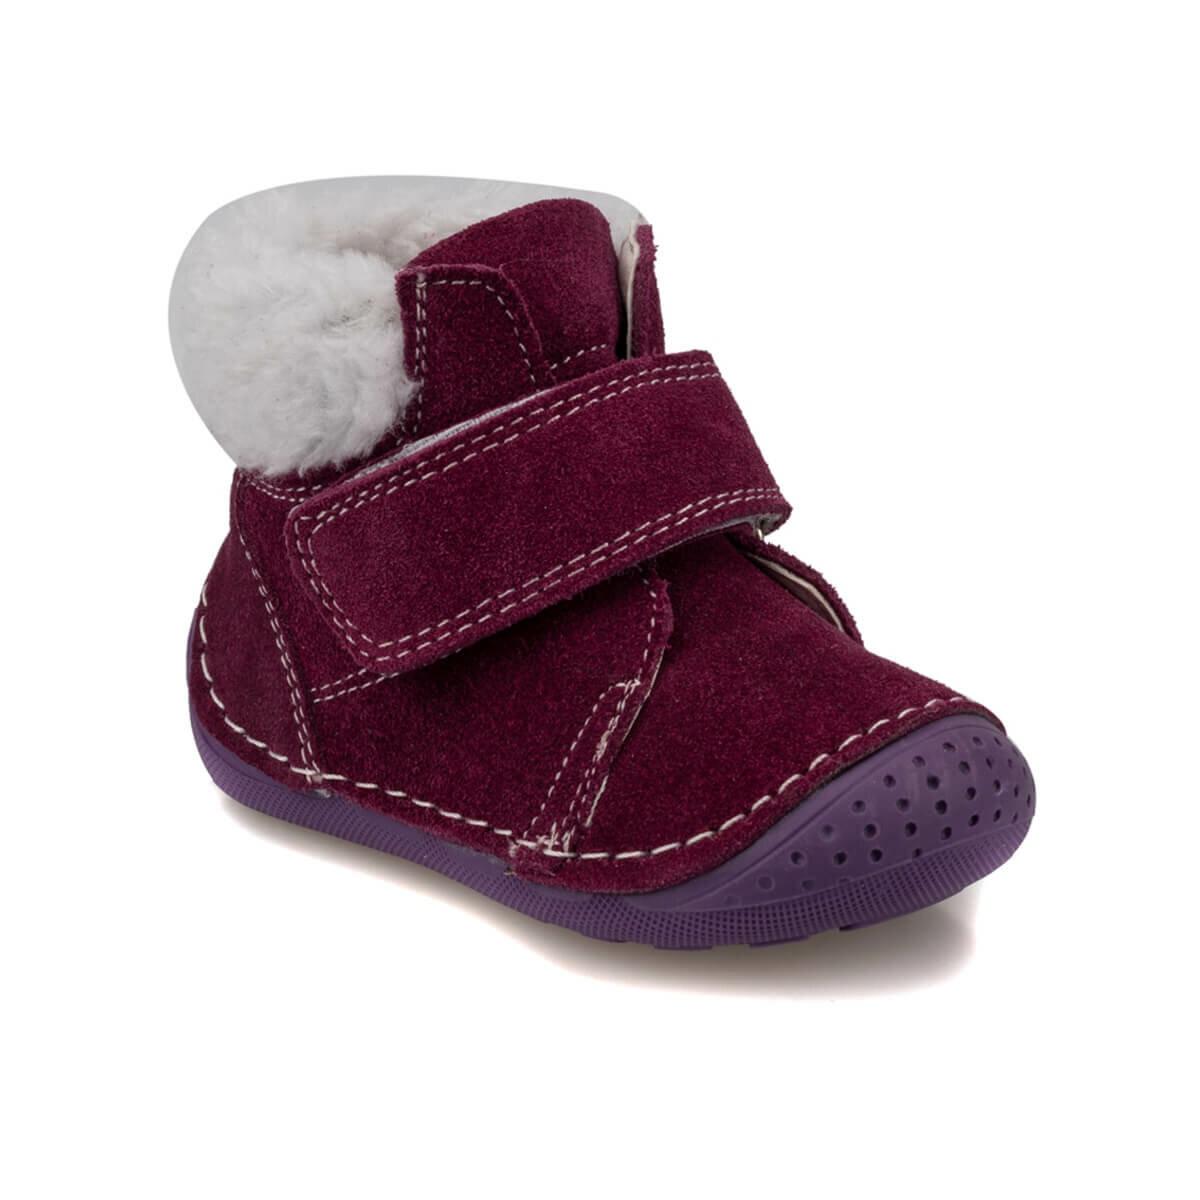 FLO 92.510503.I Purple Female Child Sneaker Shoes Polaris